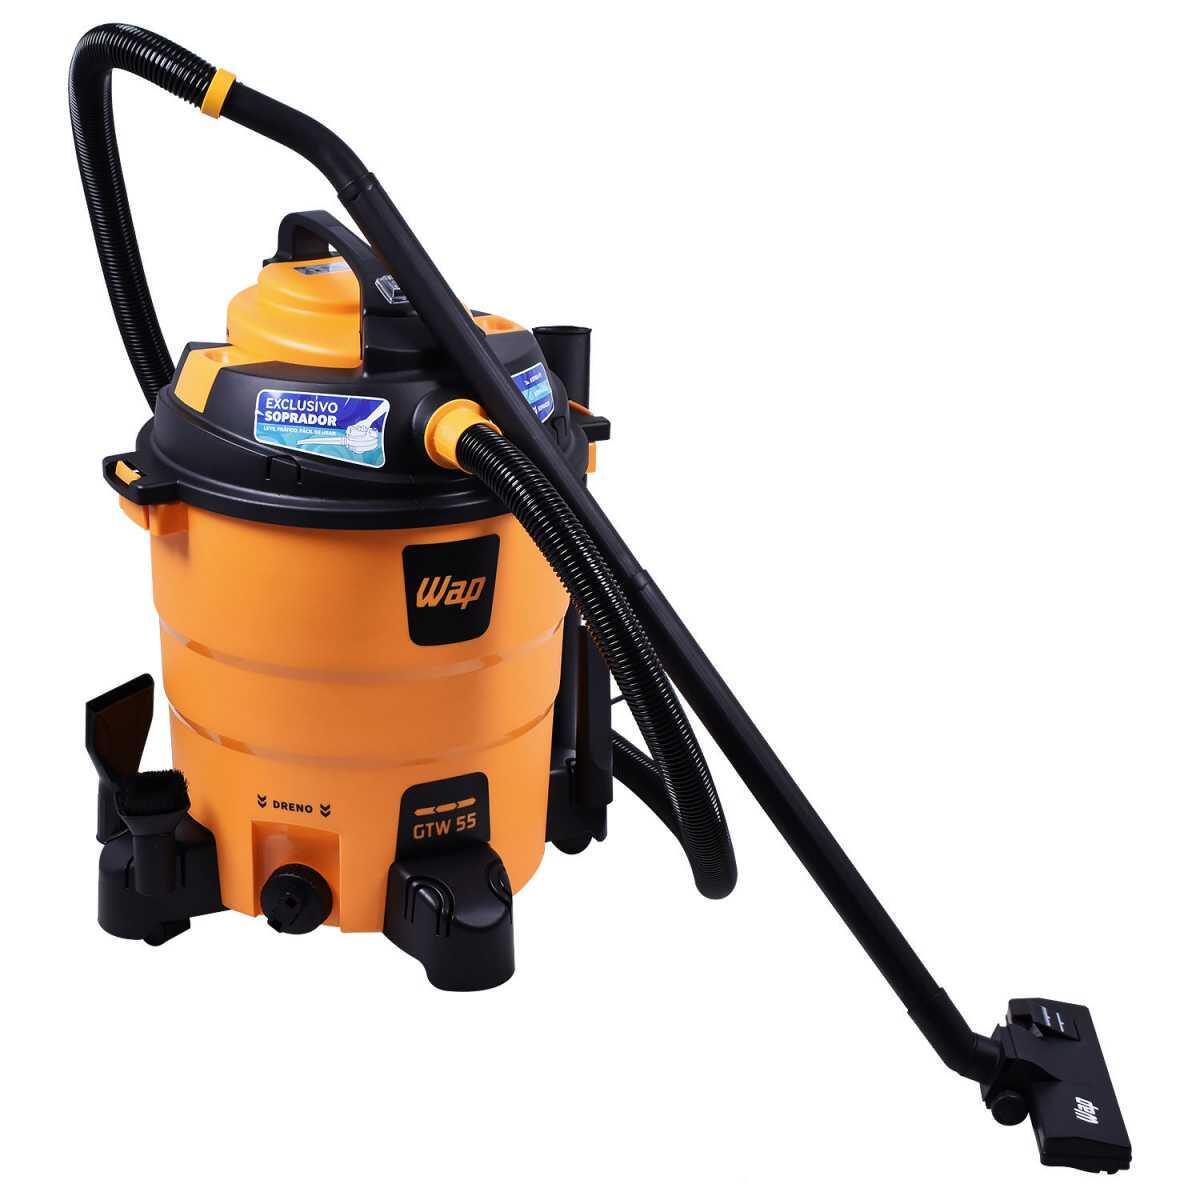 Soprador e Aspirador de Pó e Água 1600W 55 Litros Gtw55 Wap